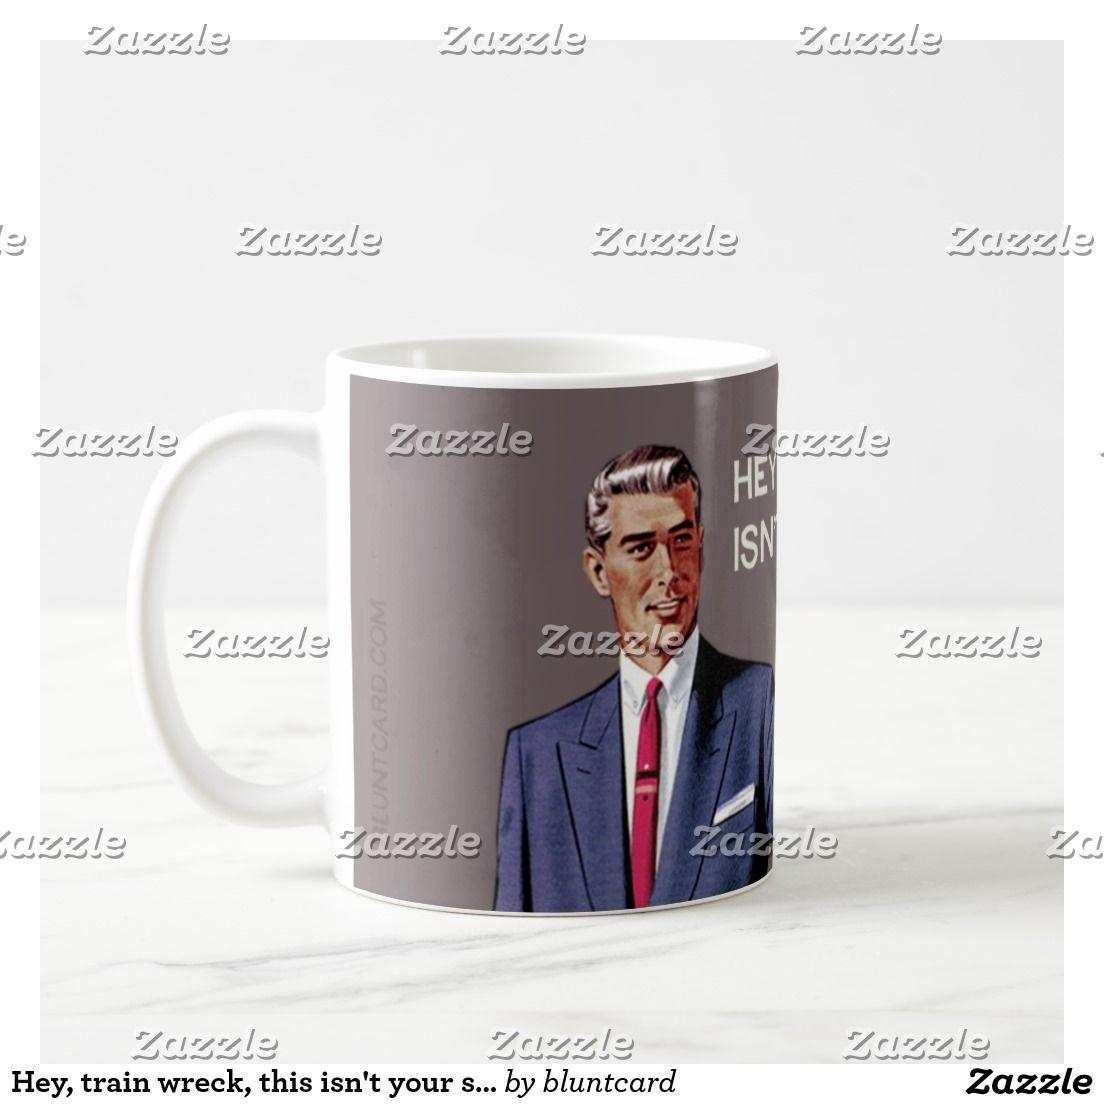 Hey train wreck this isnut your station funny coffee mug funny